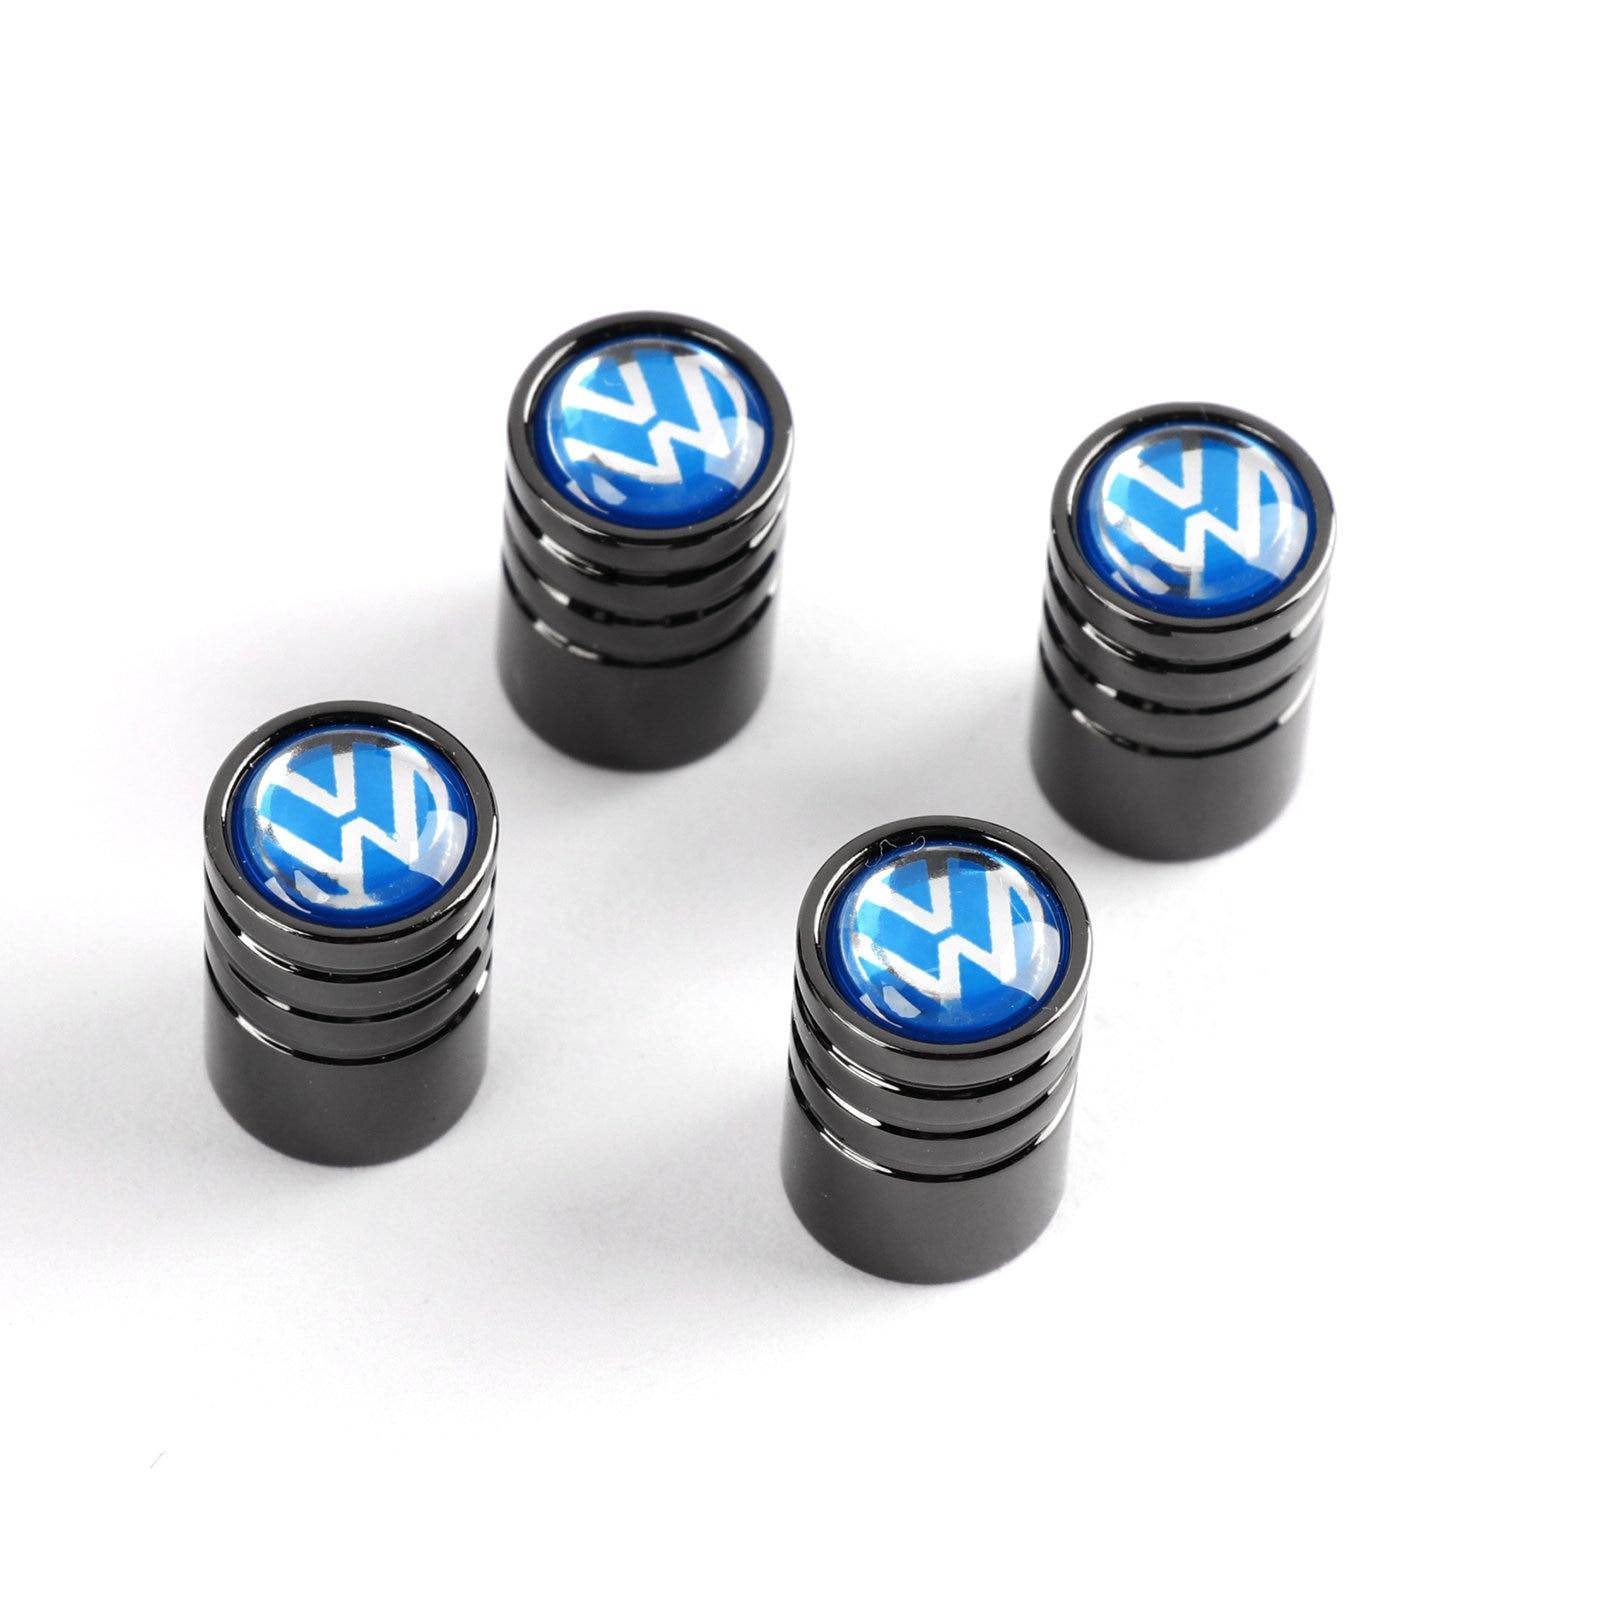 4pcs Set Gloss Blue Car Wheel Air Cap Tire Valve Dust Caps Lug Stem Styling For VW Volkswagen Scirocco Jetta Golf Passat Tiguan